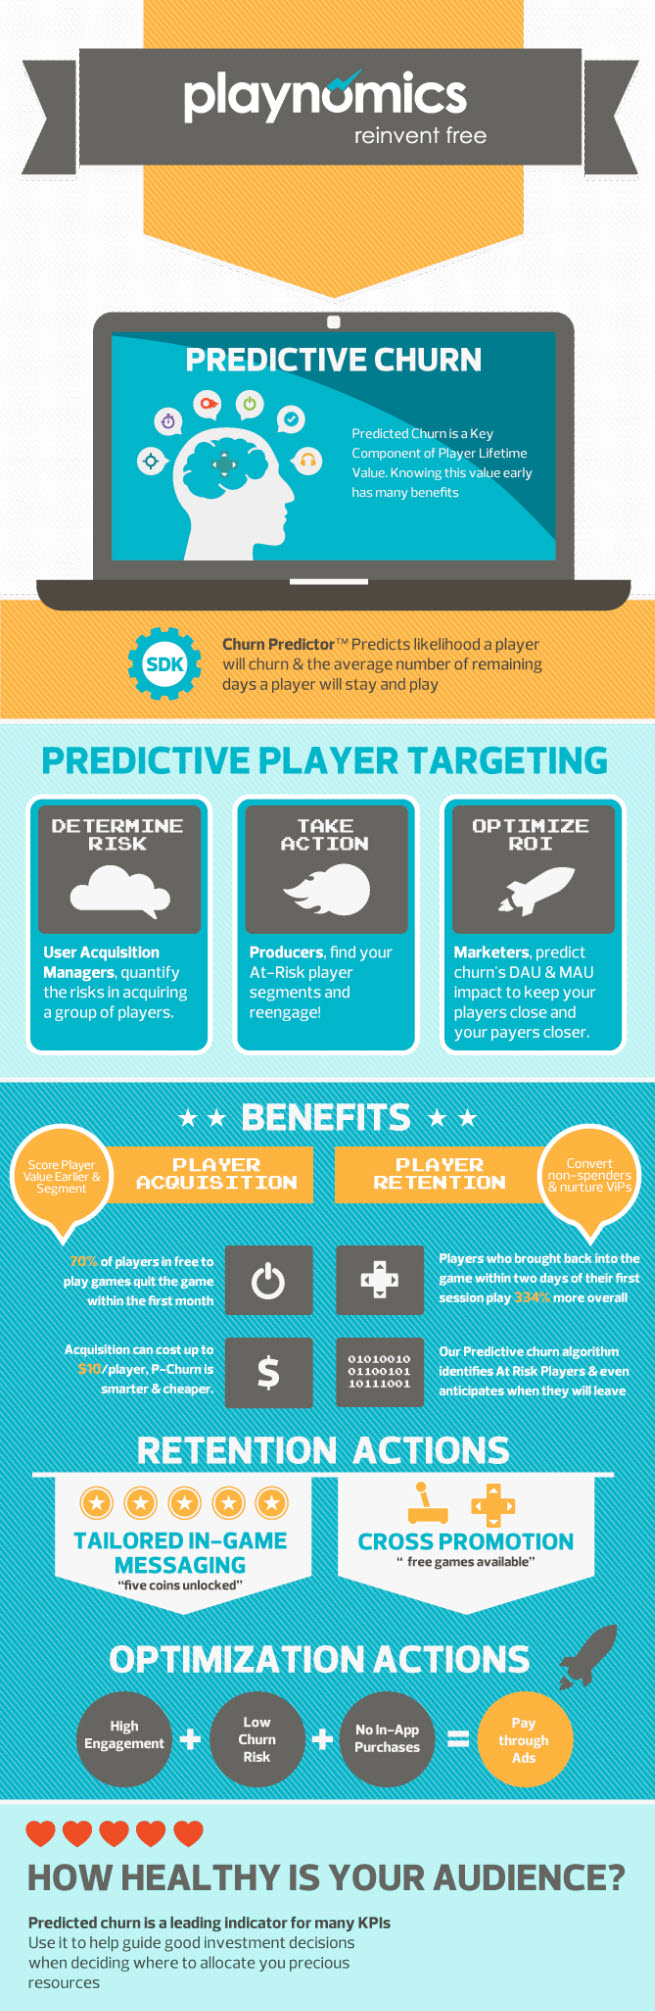 Playnomics infographic